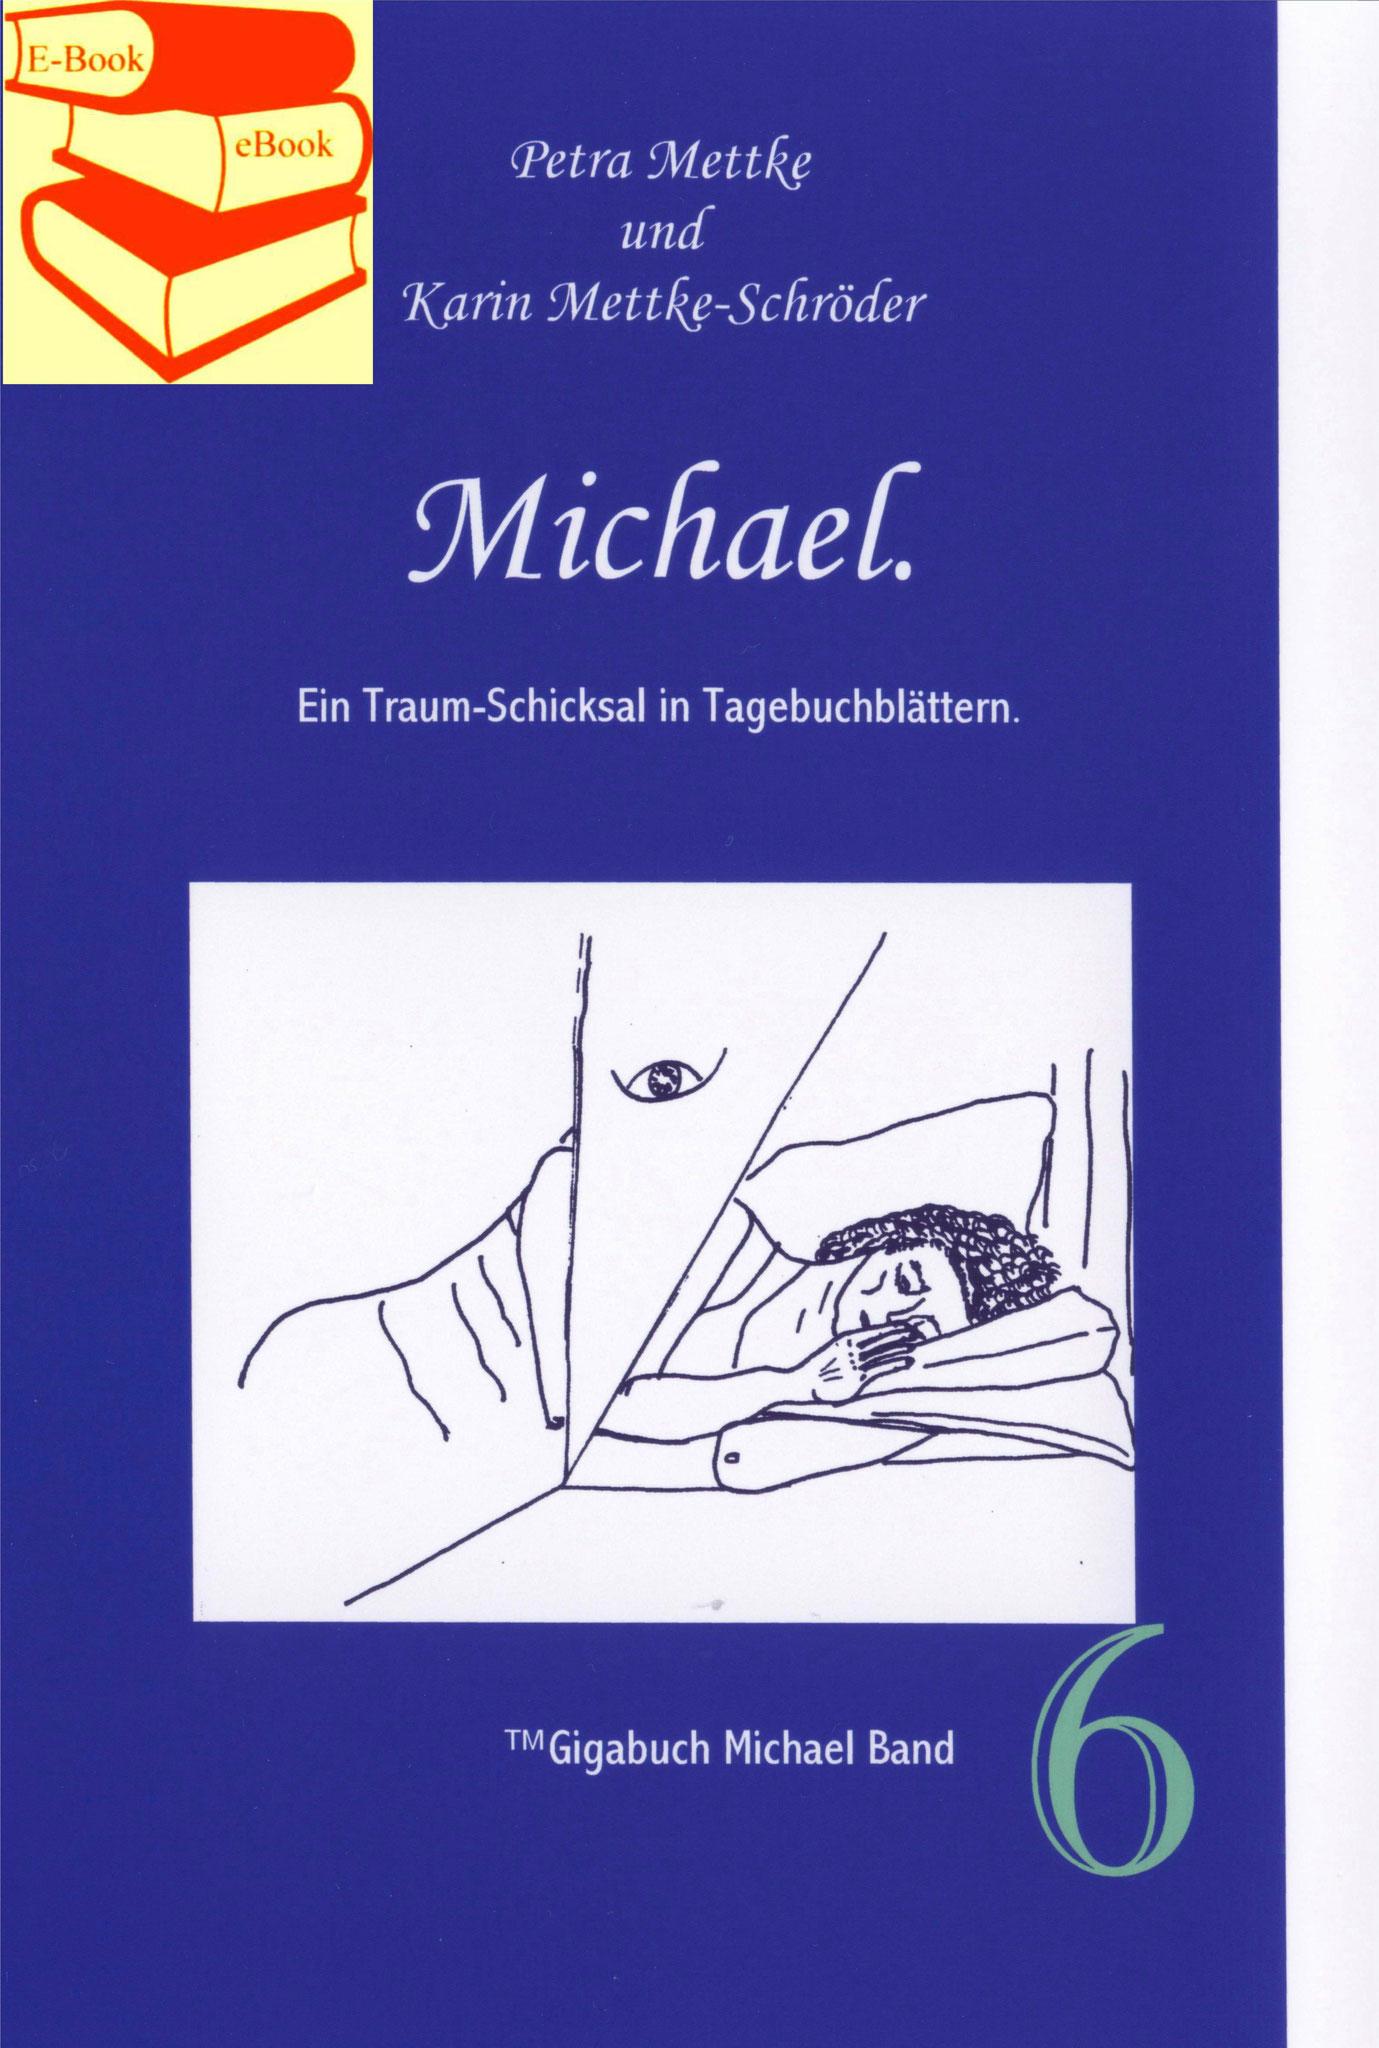 Petra Mettke, Karin Mettke-Schröder/™Gigabuch Michael 06/eBook/2014/ISBN 9783735764